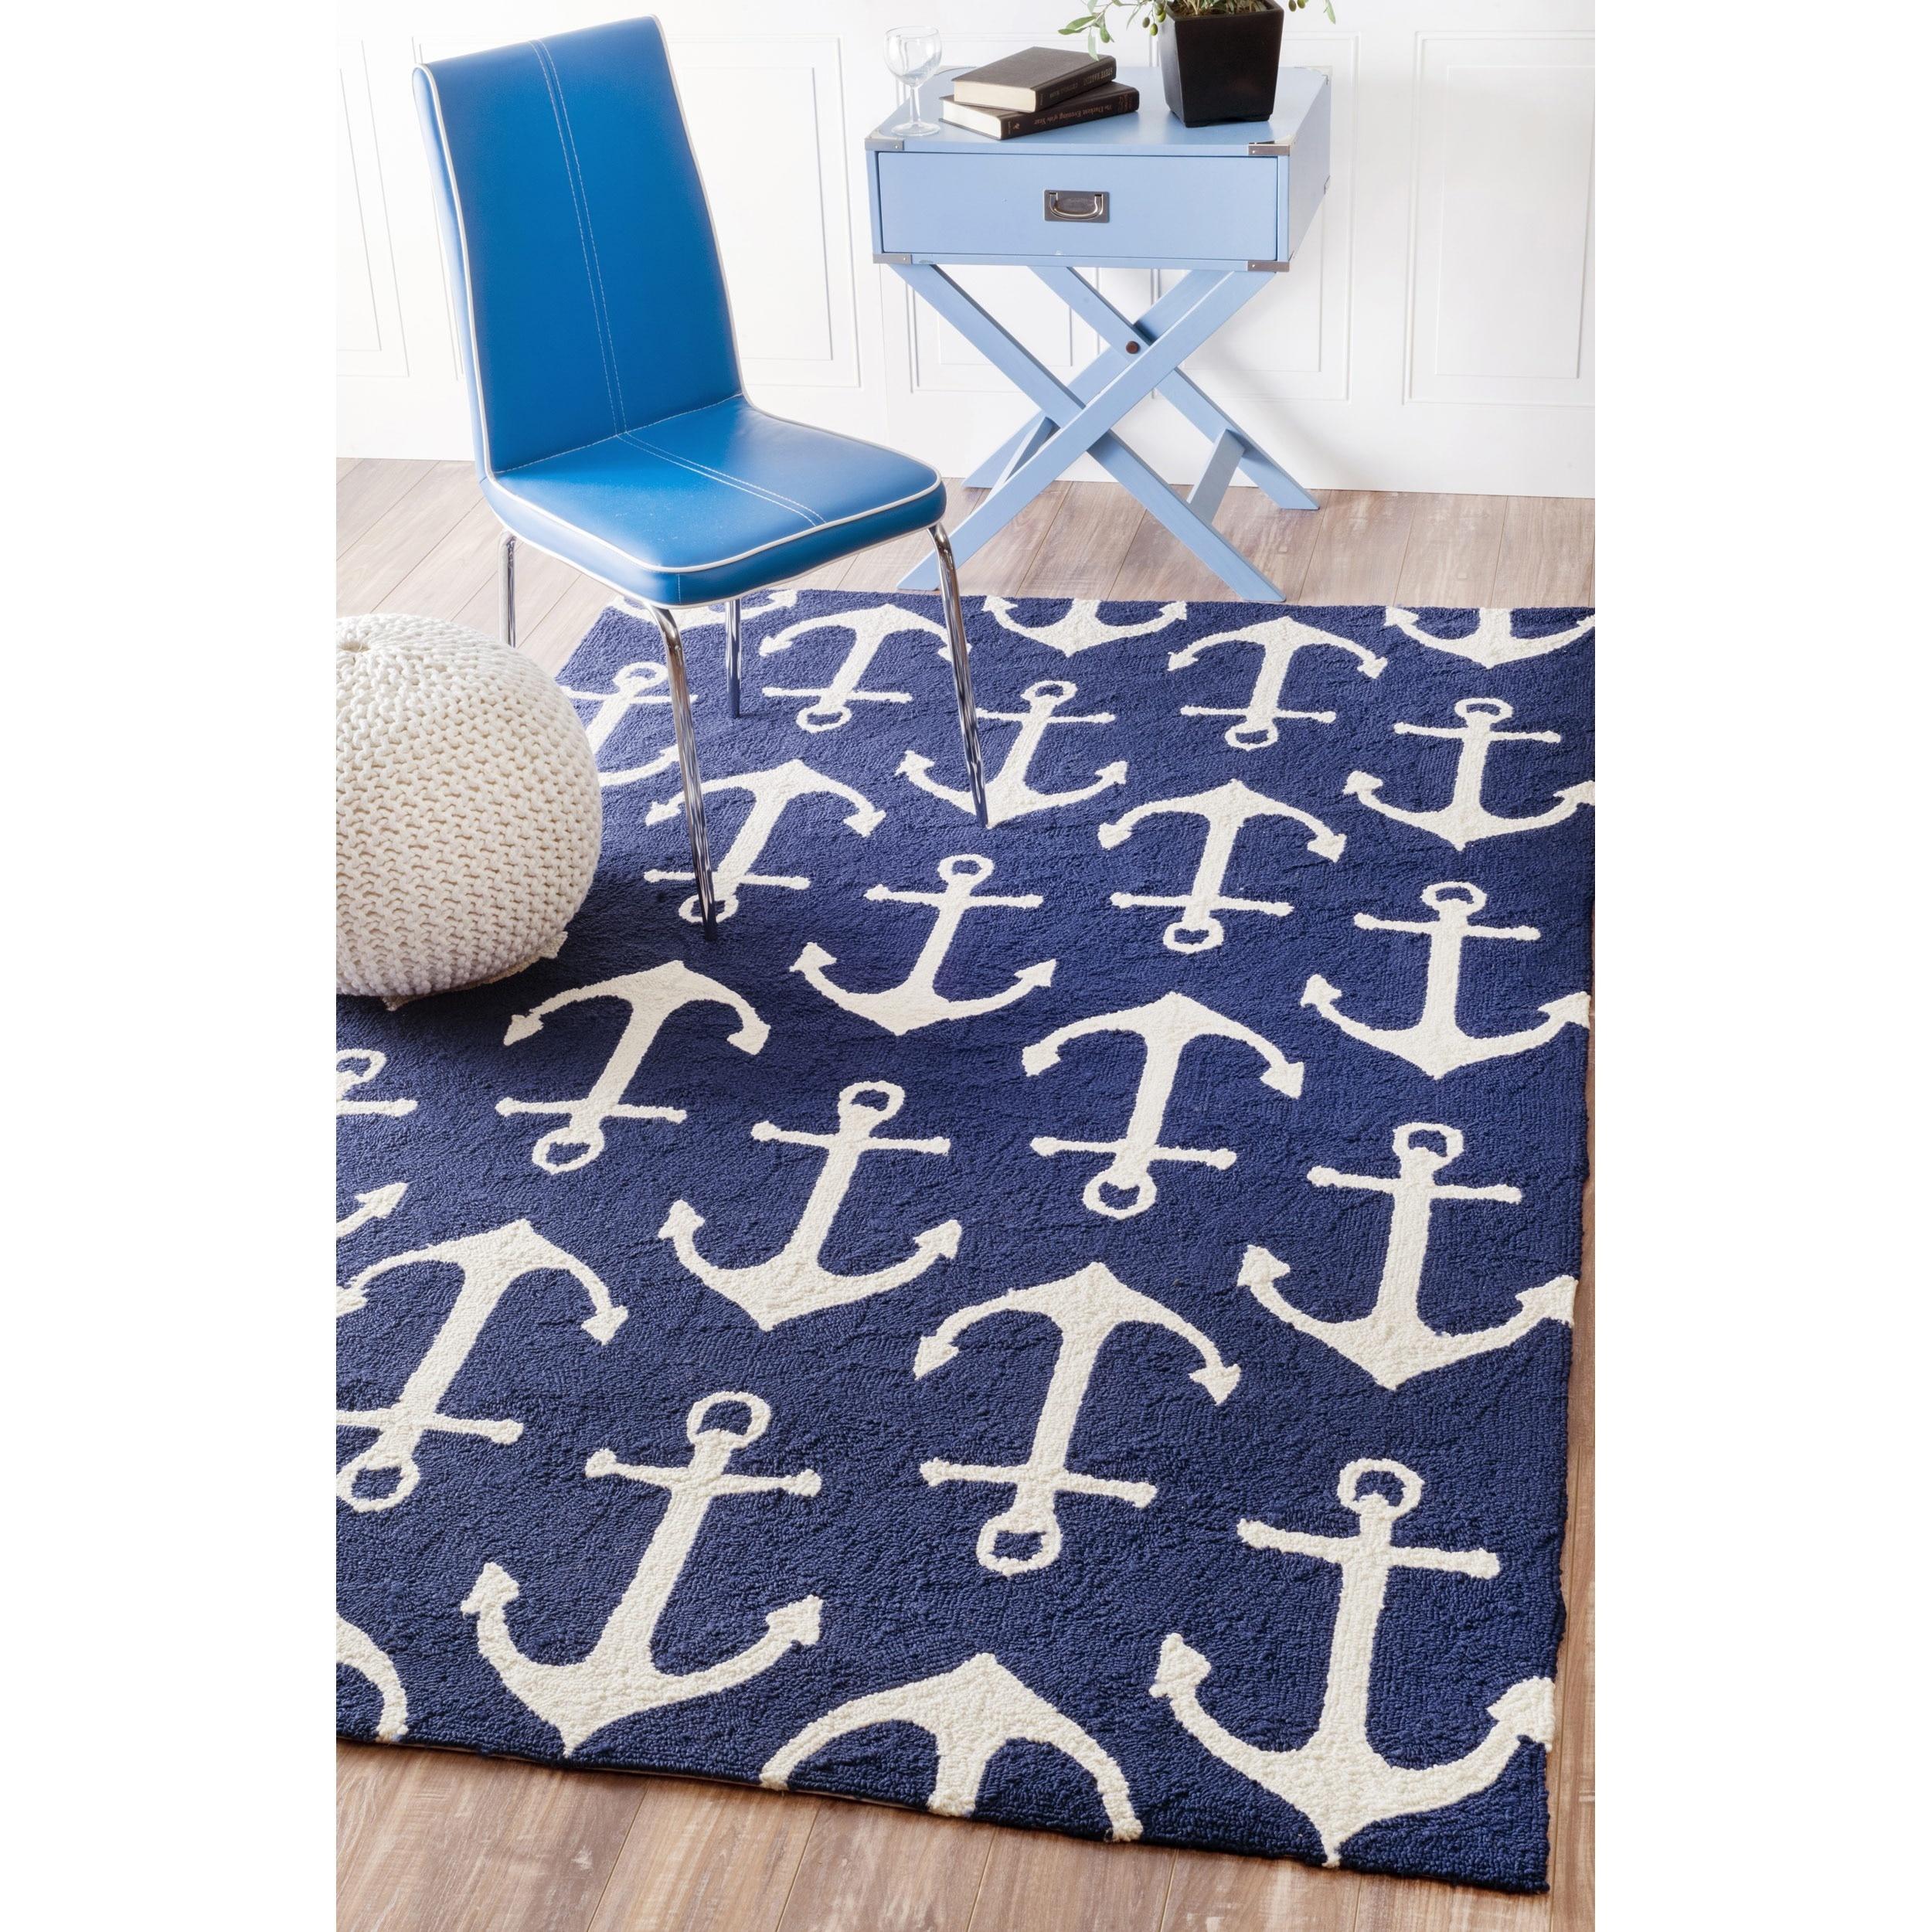 Nuloom Indoor Outdoor Novelty Nautical Anchors Area Rug 8 X 10 Com